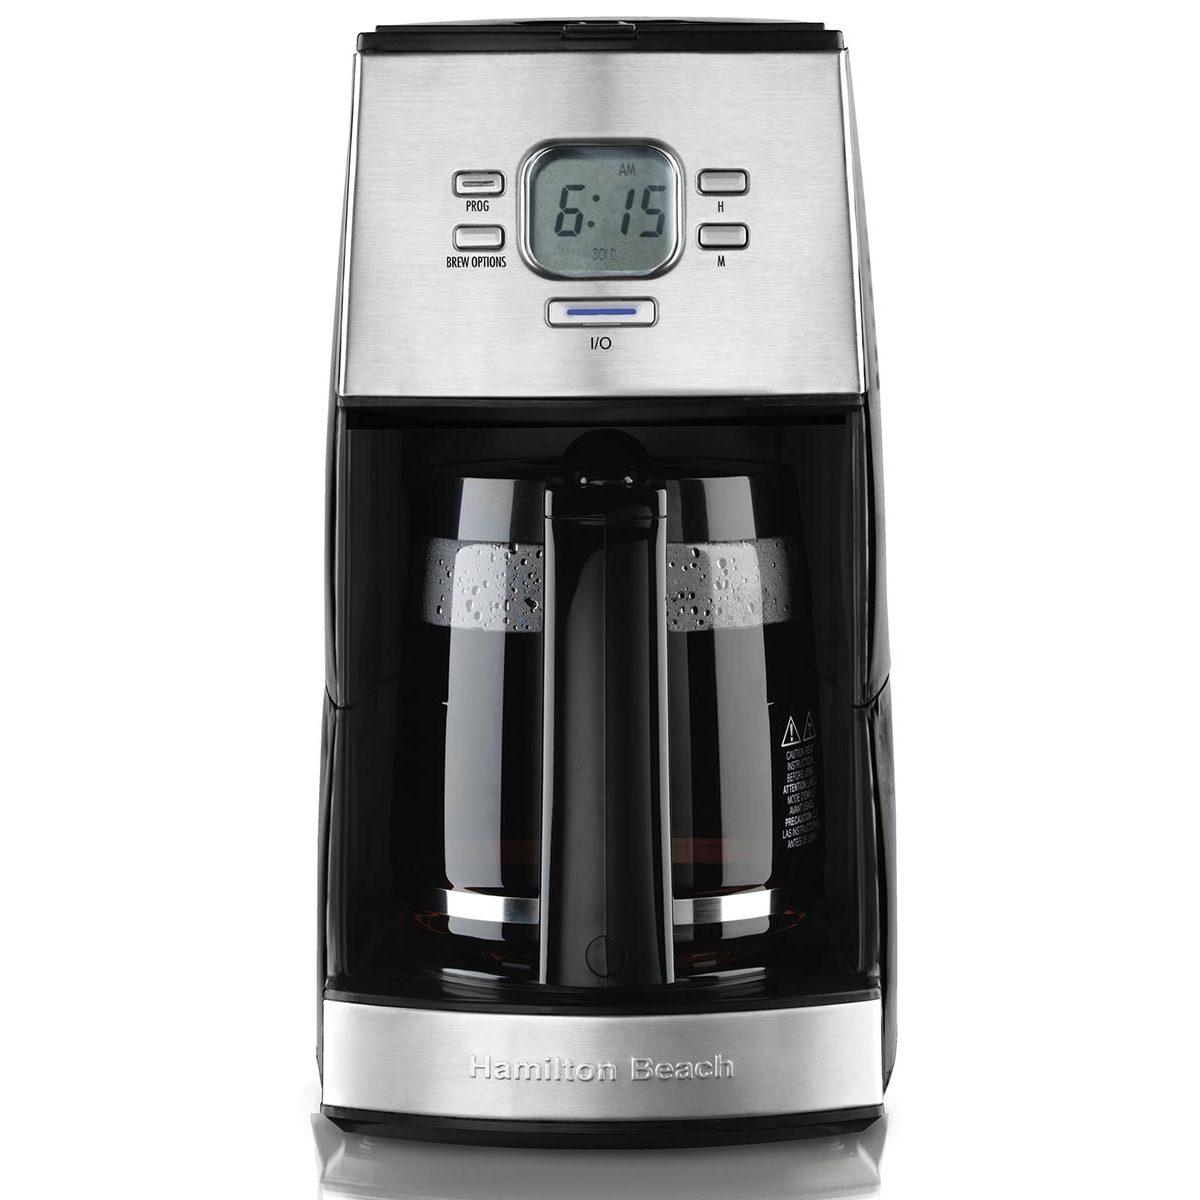 Hamilton Beach 12 Cup Programmable Coffee Maker Black 43254r